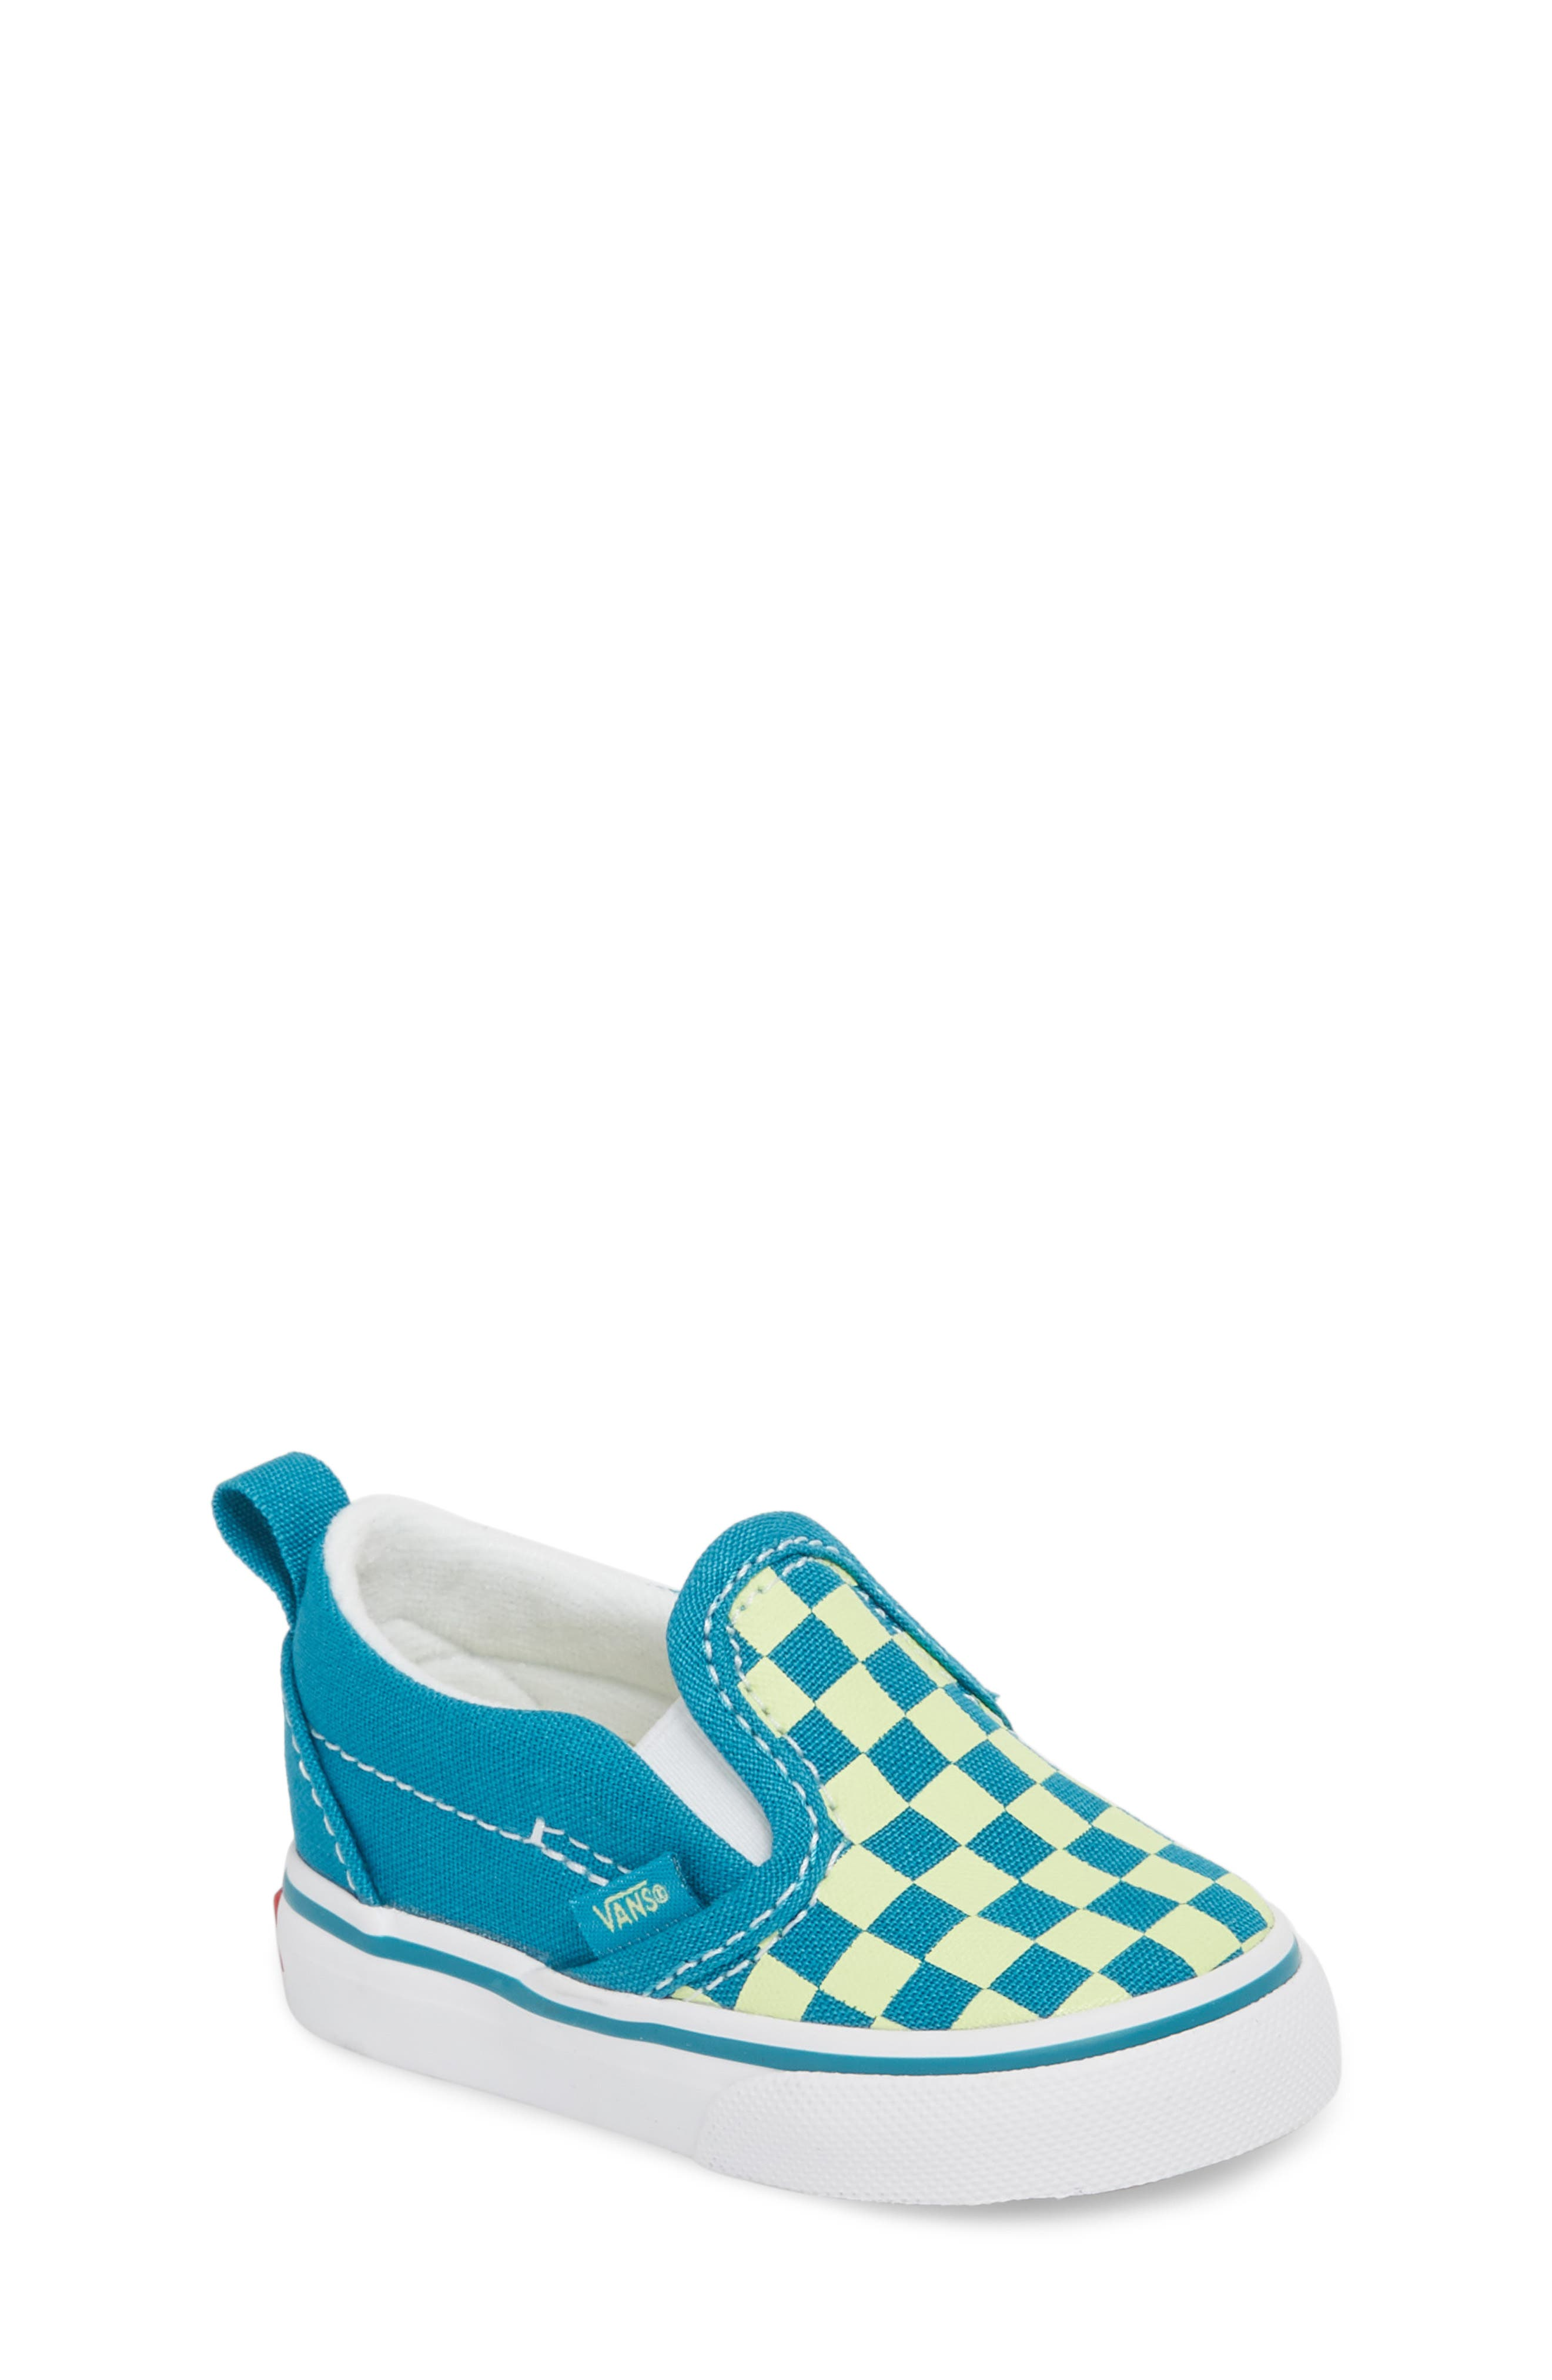 Slip-On Crib Shoe,                         Main,                         color, ENAMEL BLUE/ SHARP GREEN